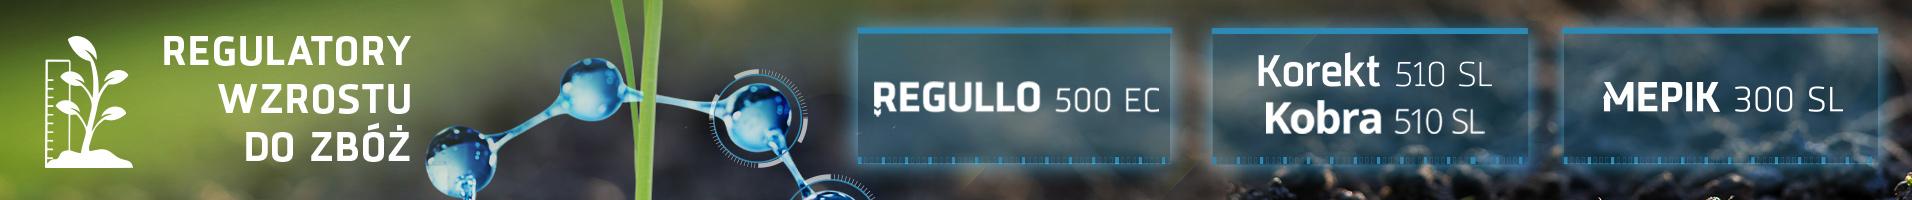 zbozowe-regulatory-wzrostu